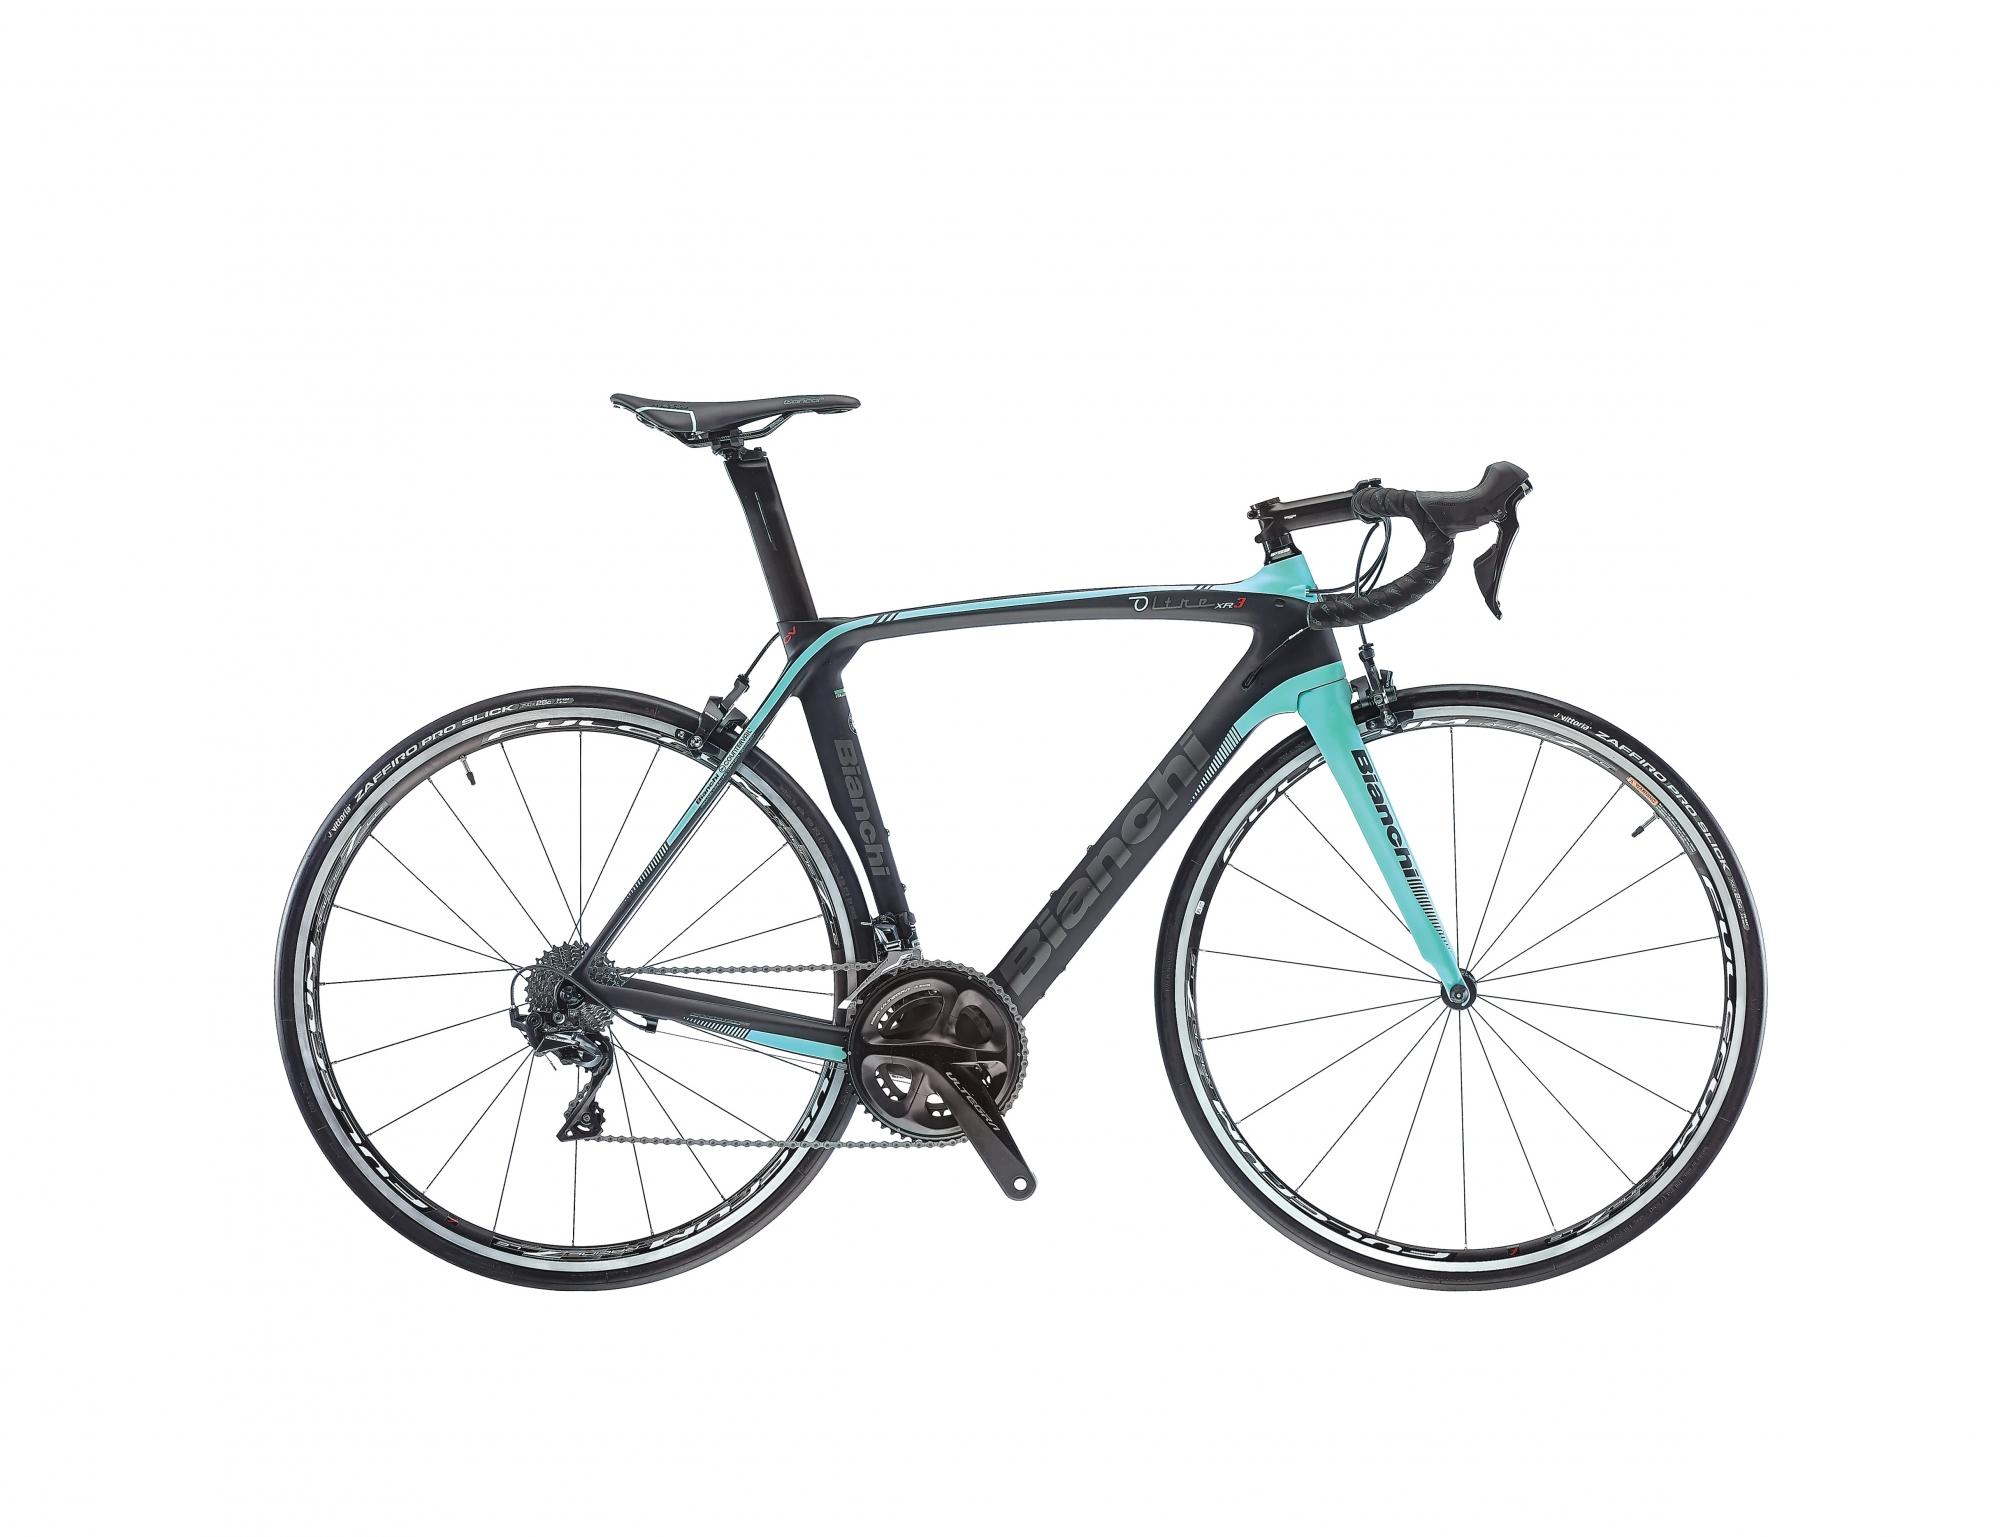 bianchi oltre xr3 ultegra r8000 bike 2018